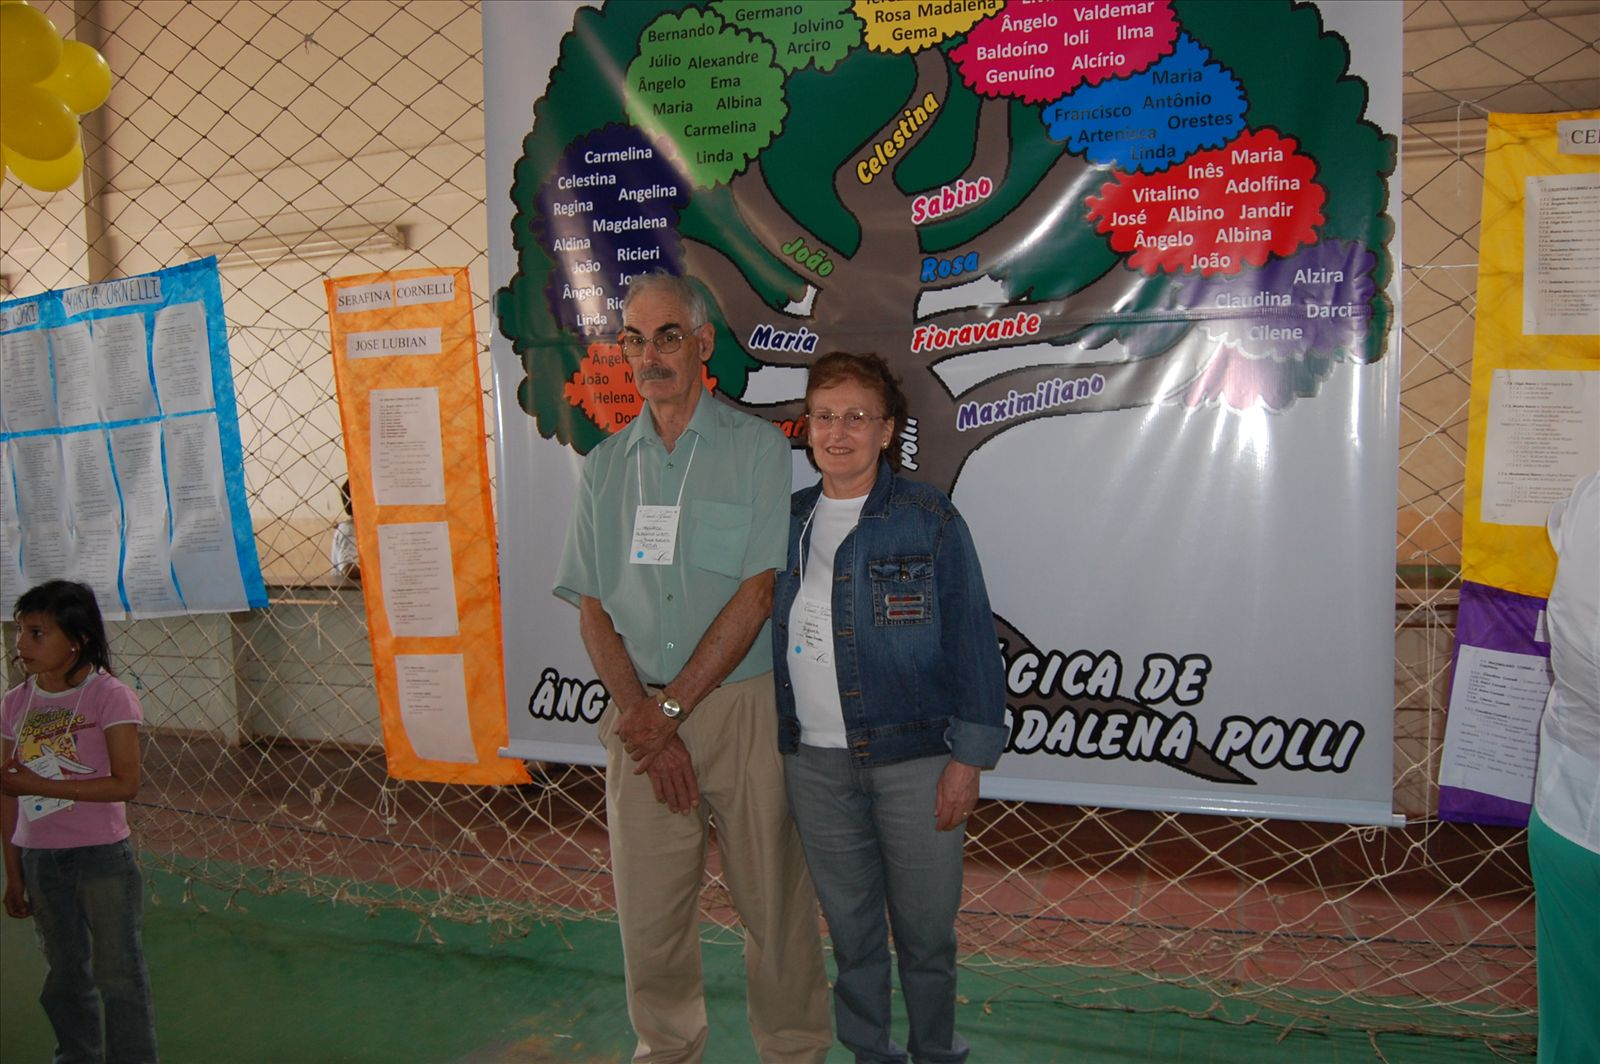 2º Encontro Família Cornelli - 11.10.2009 (73)_0